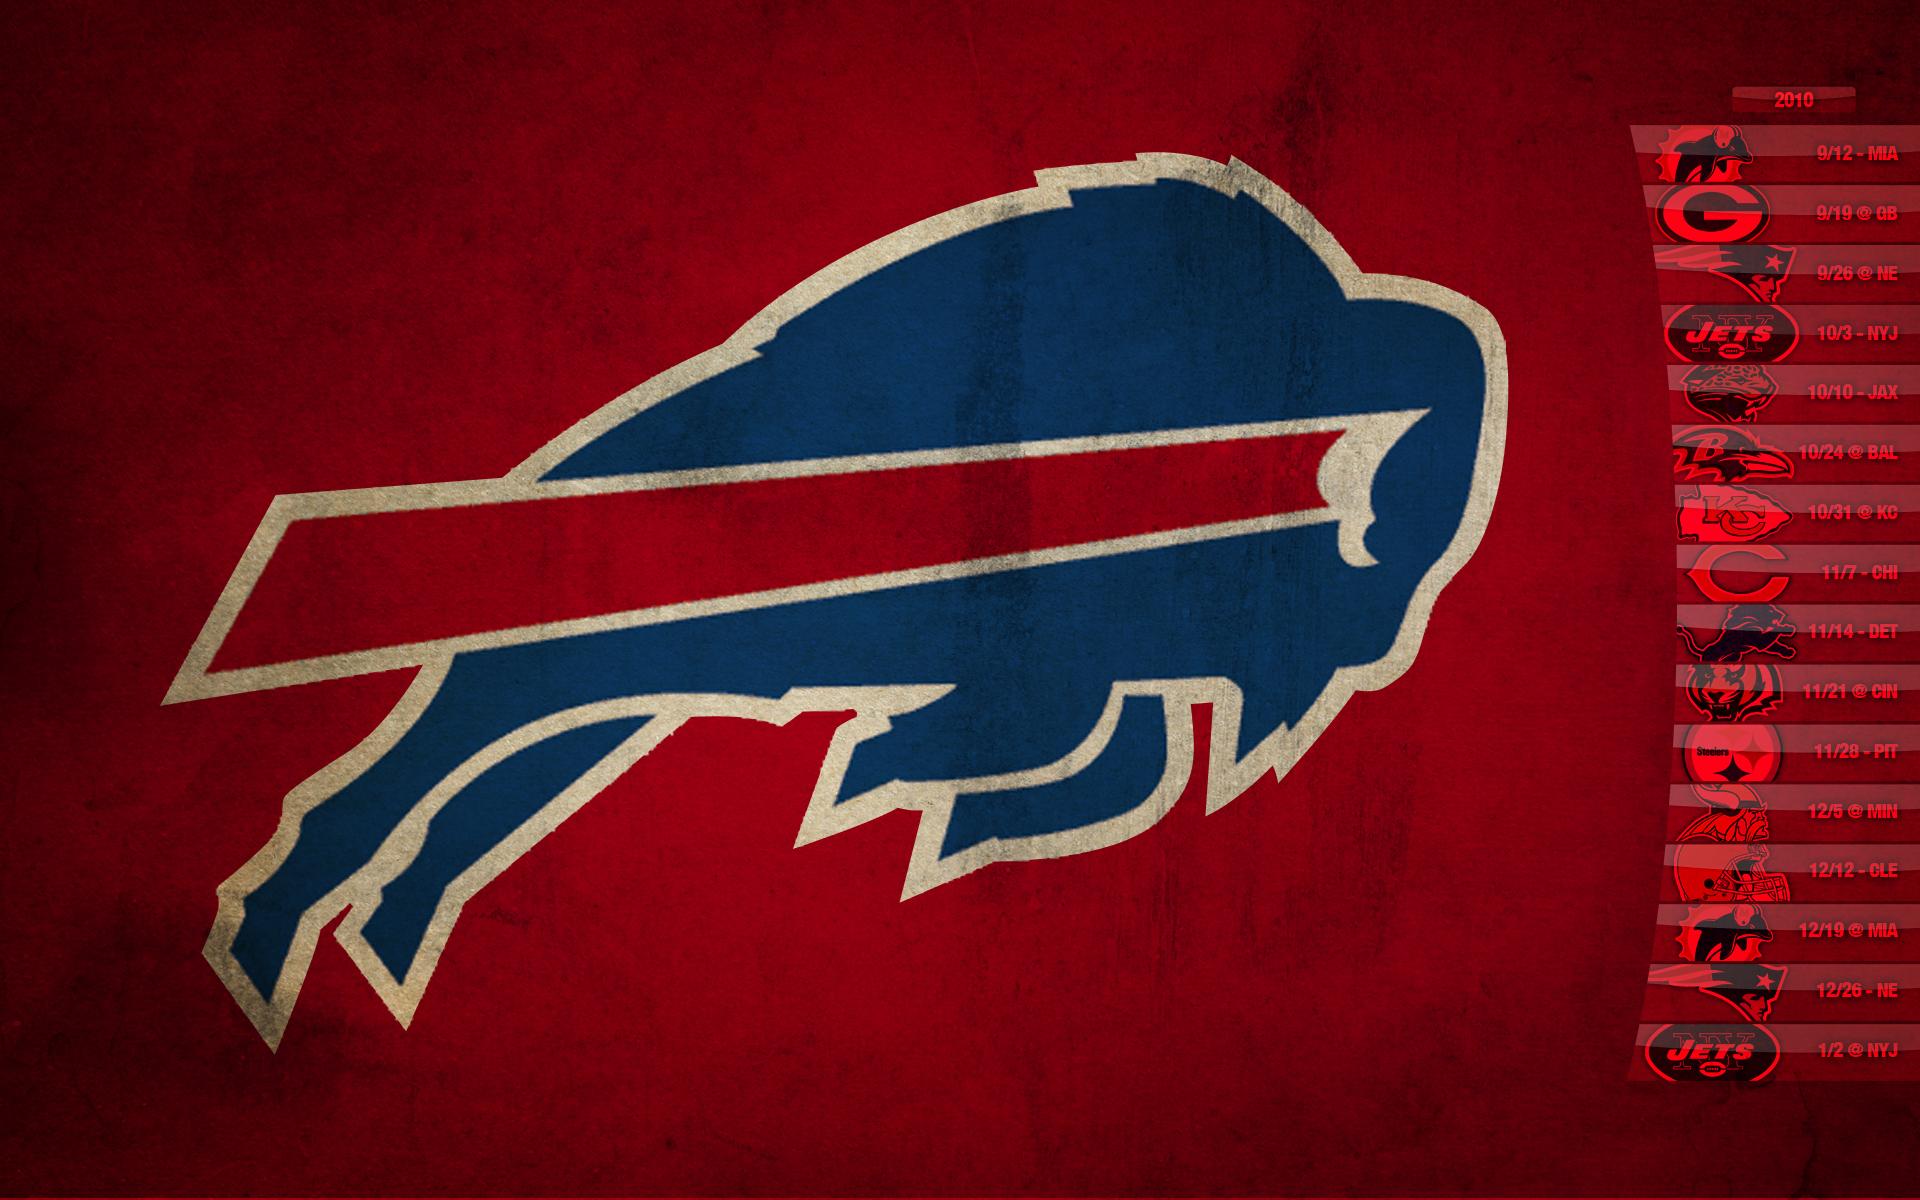 058de469 45+] Buffalo Bills 2015 Wallpaper HD on WallpaperSafari